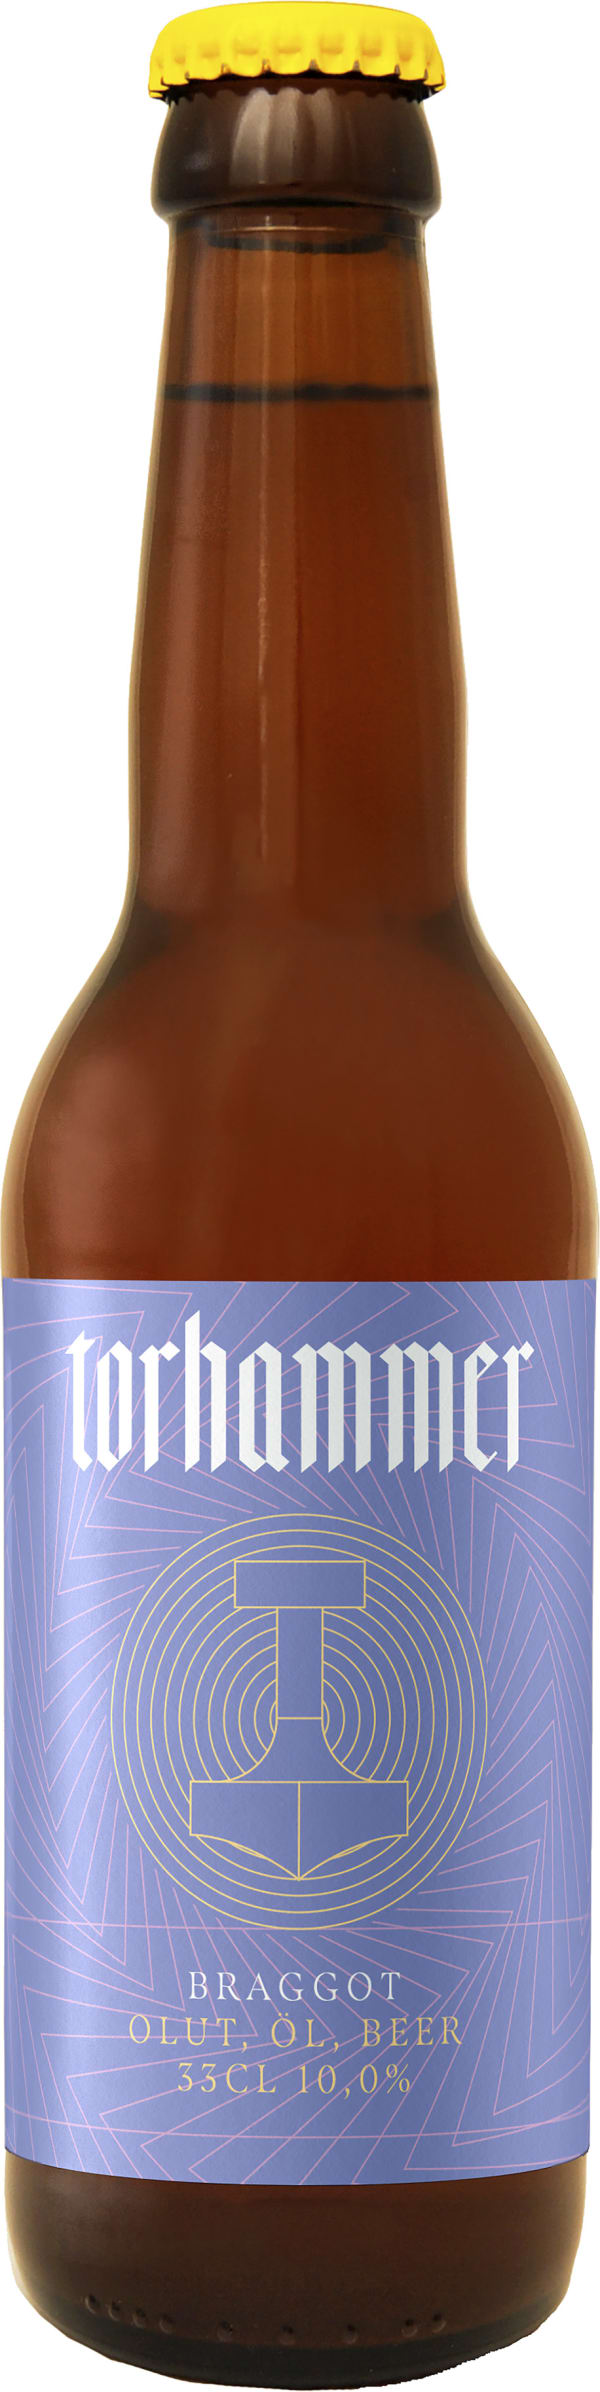 Mallaskuun Torhammer Blackcurrant Braggot